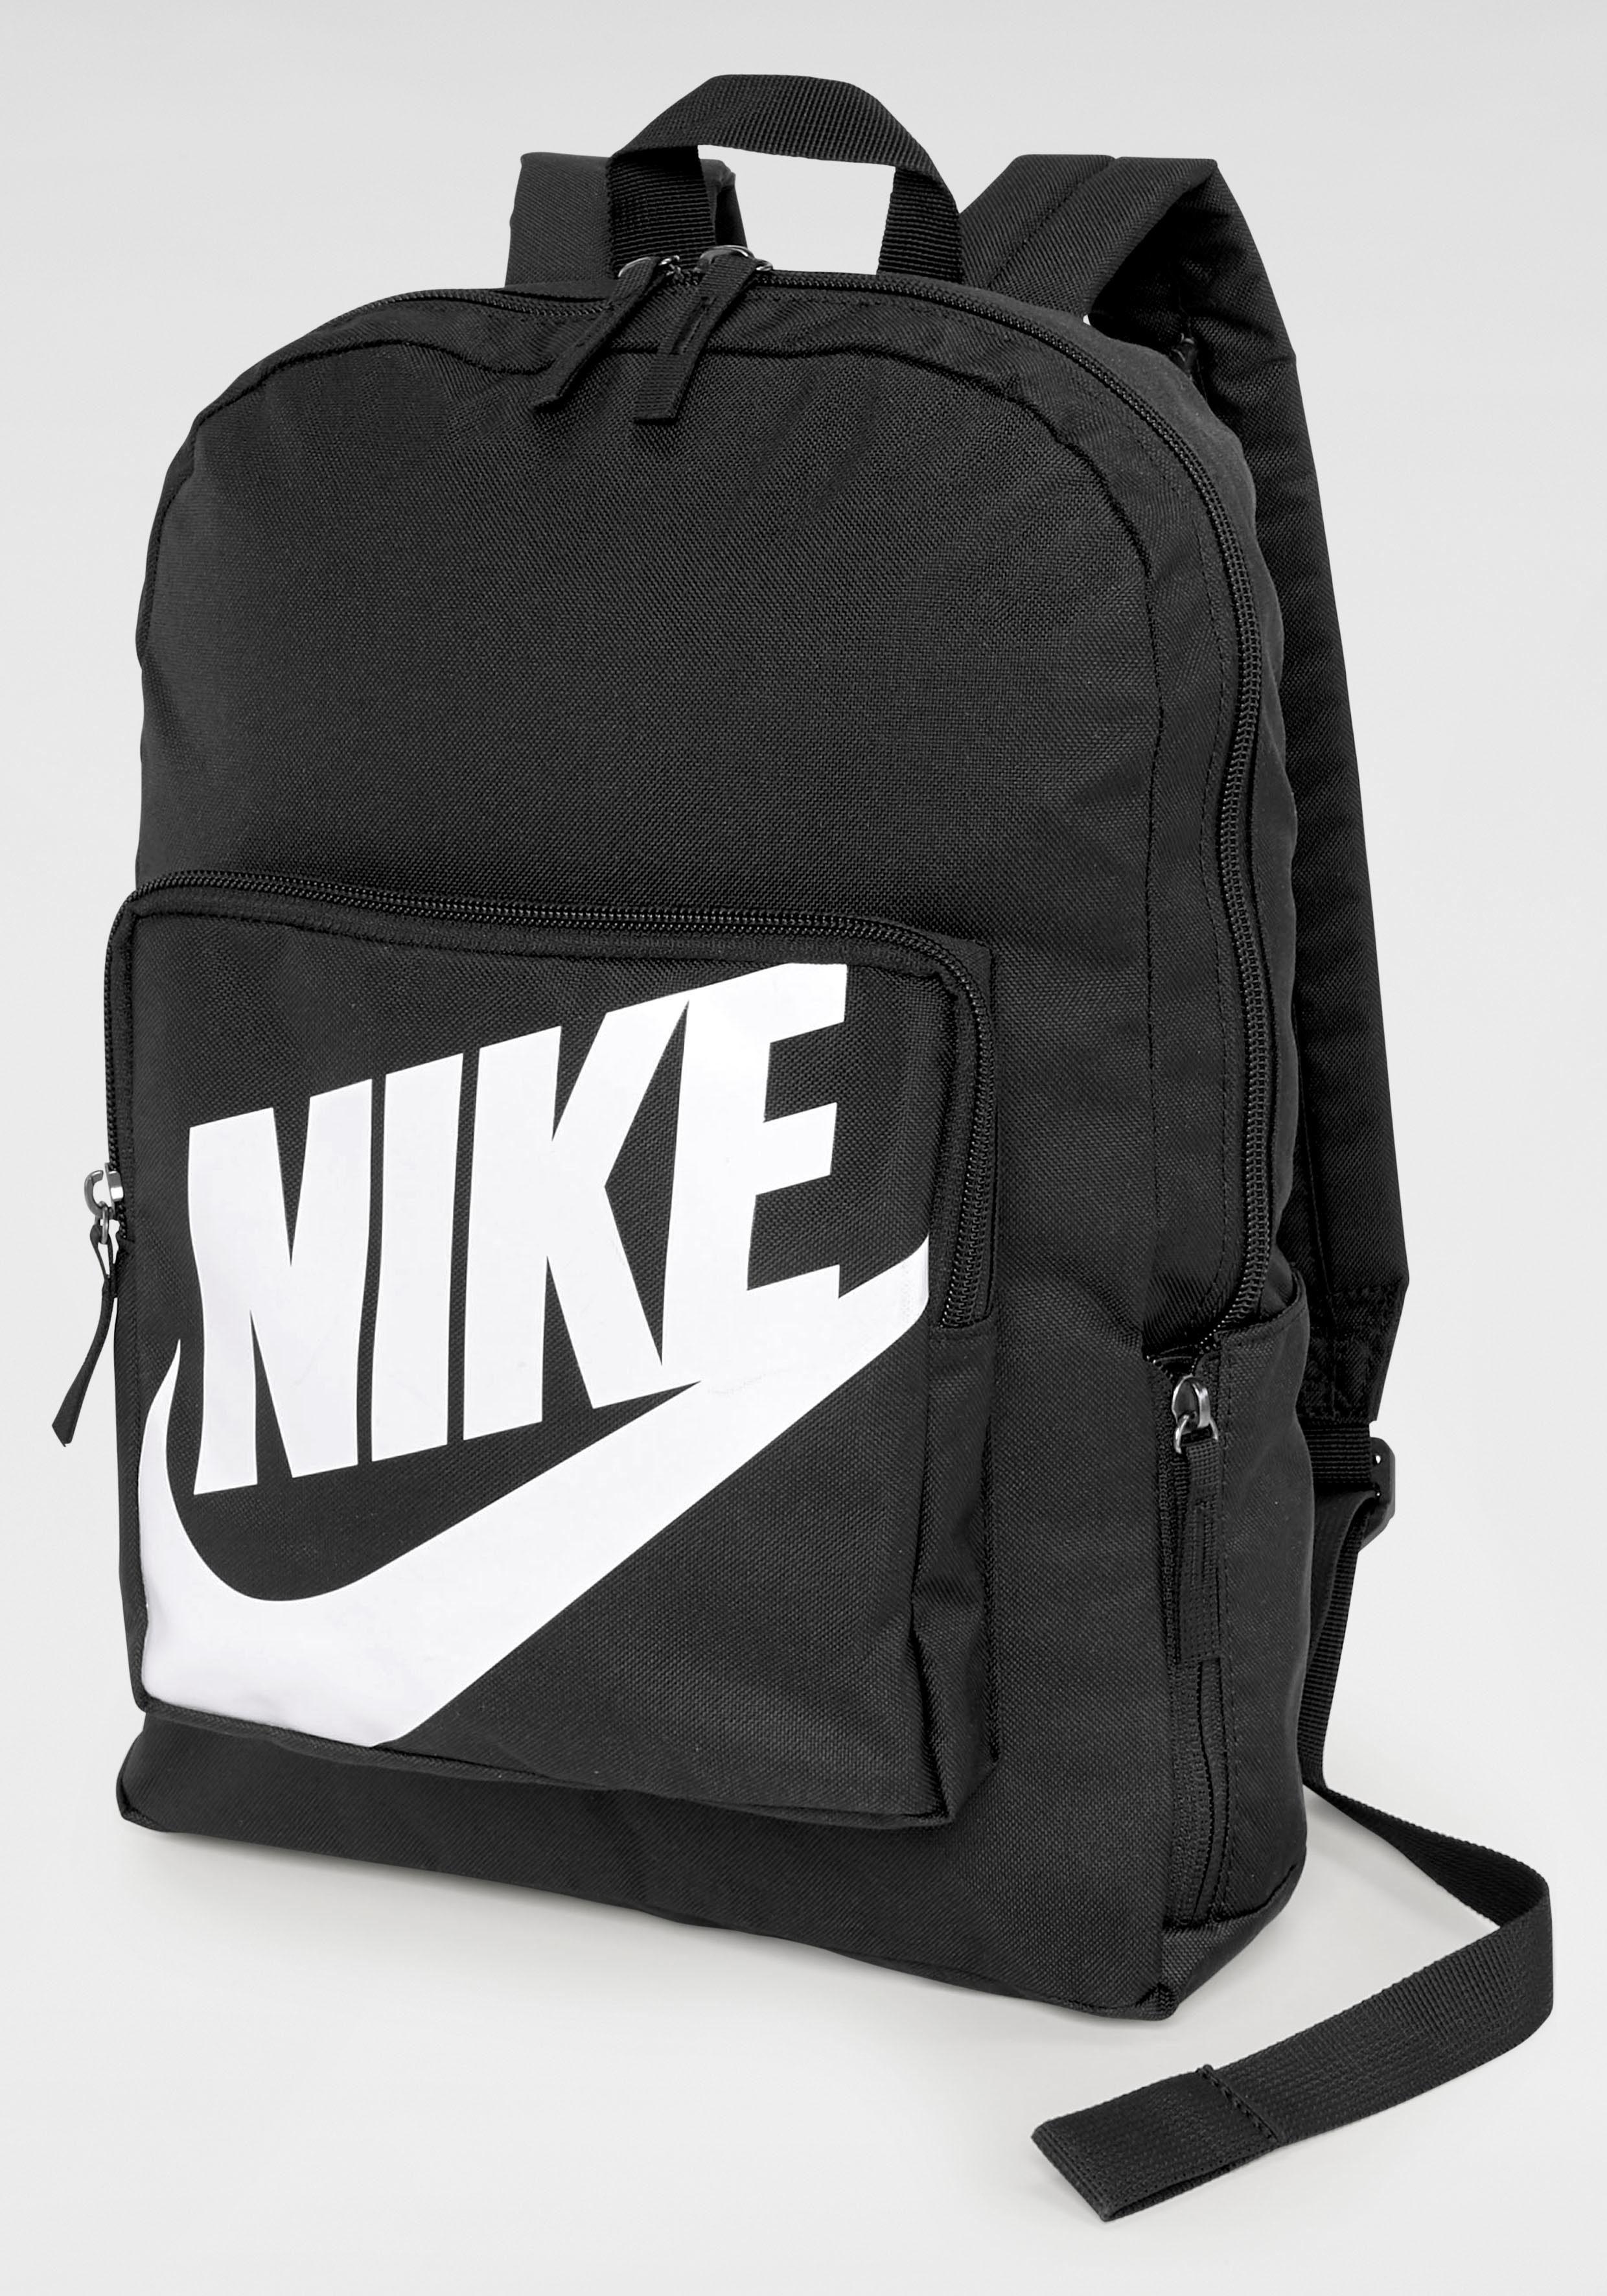 Nike Sportswear Sportrucksack »YOUTH NIKE CLASSIC BACKPACK«, Für Kinder online kaufen | OTTO